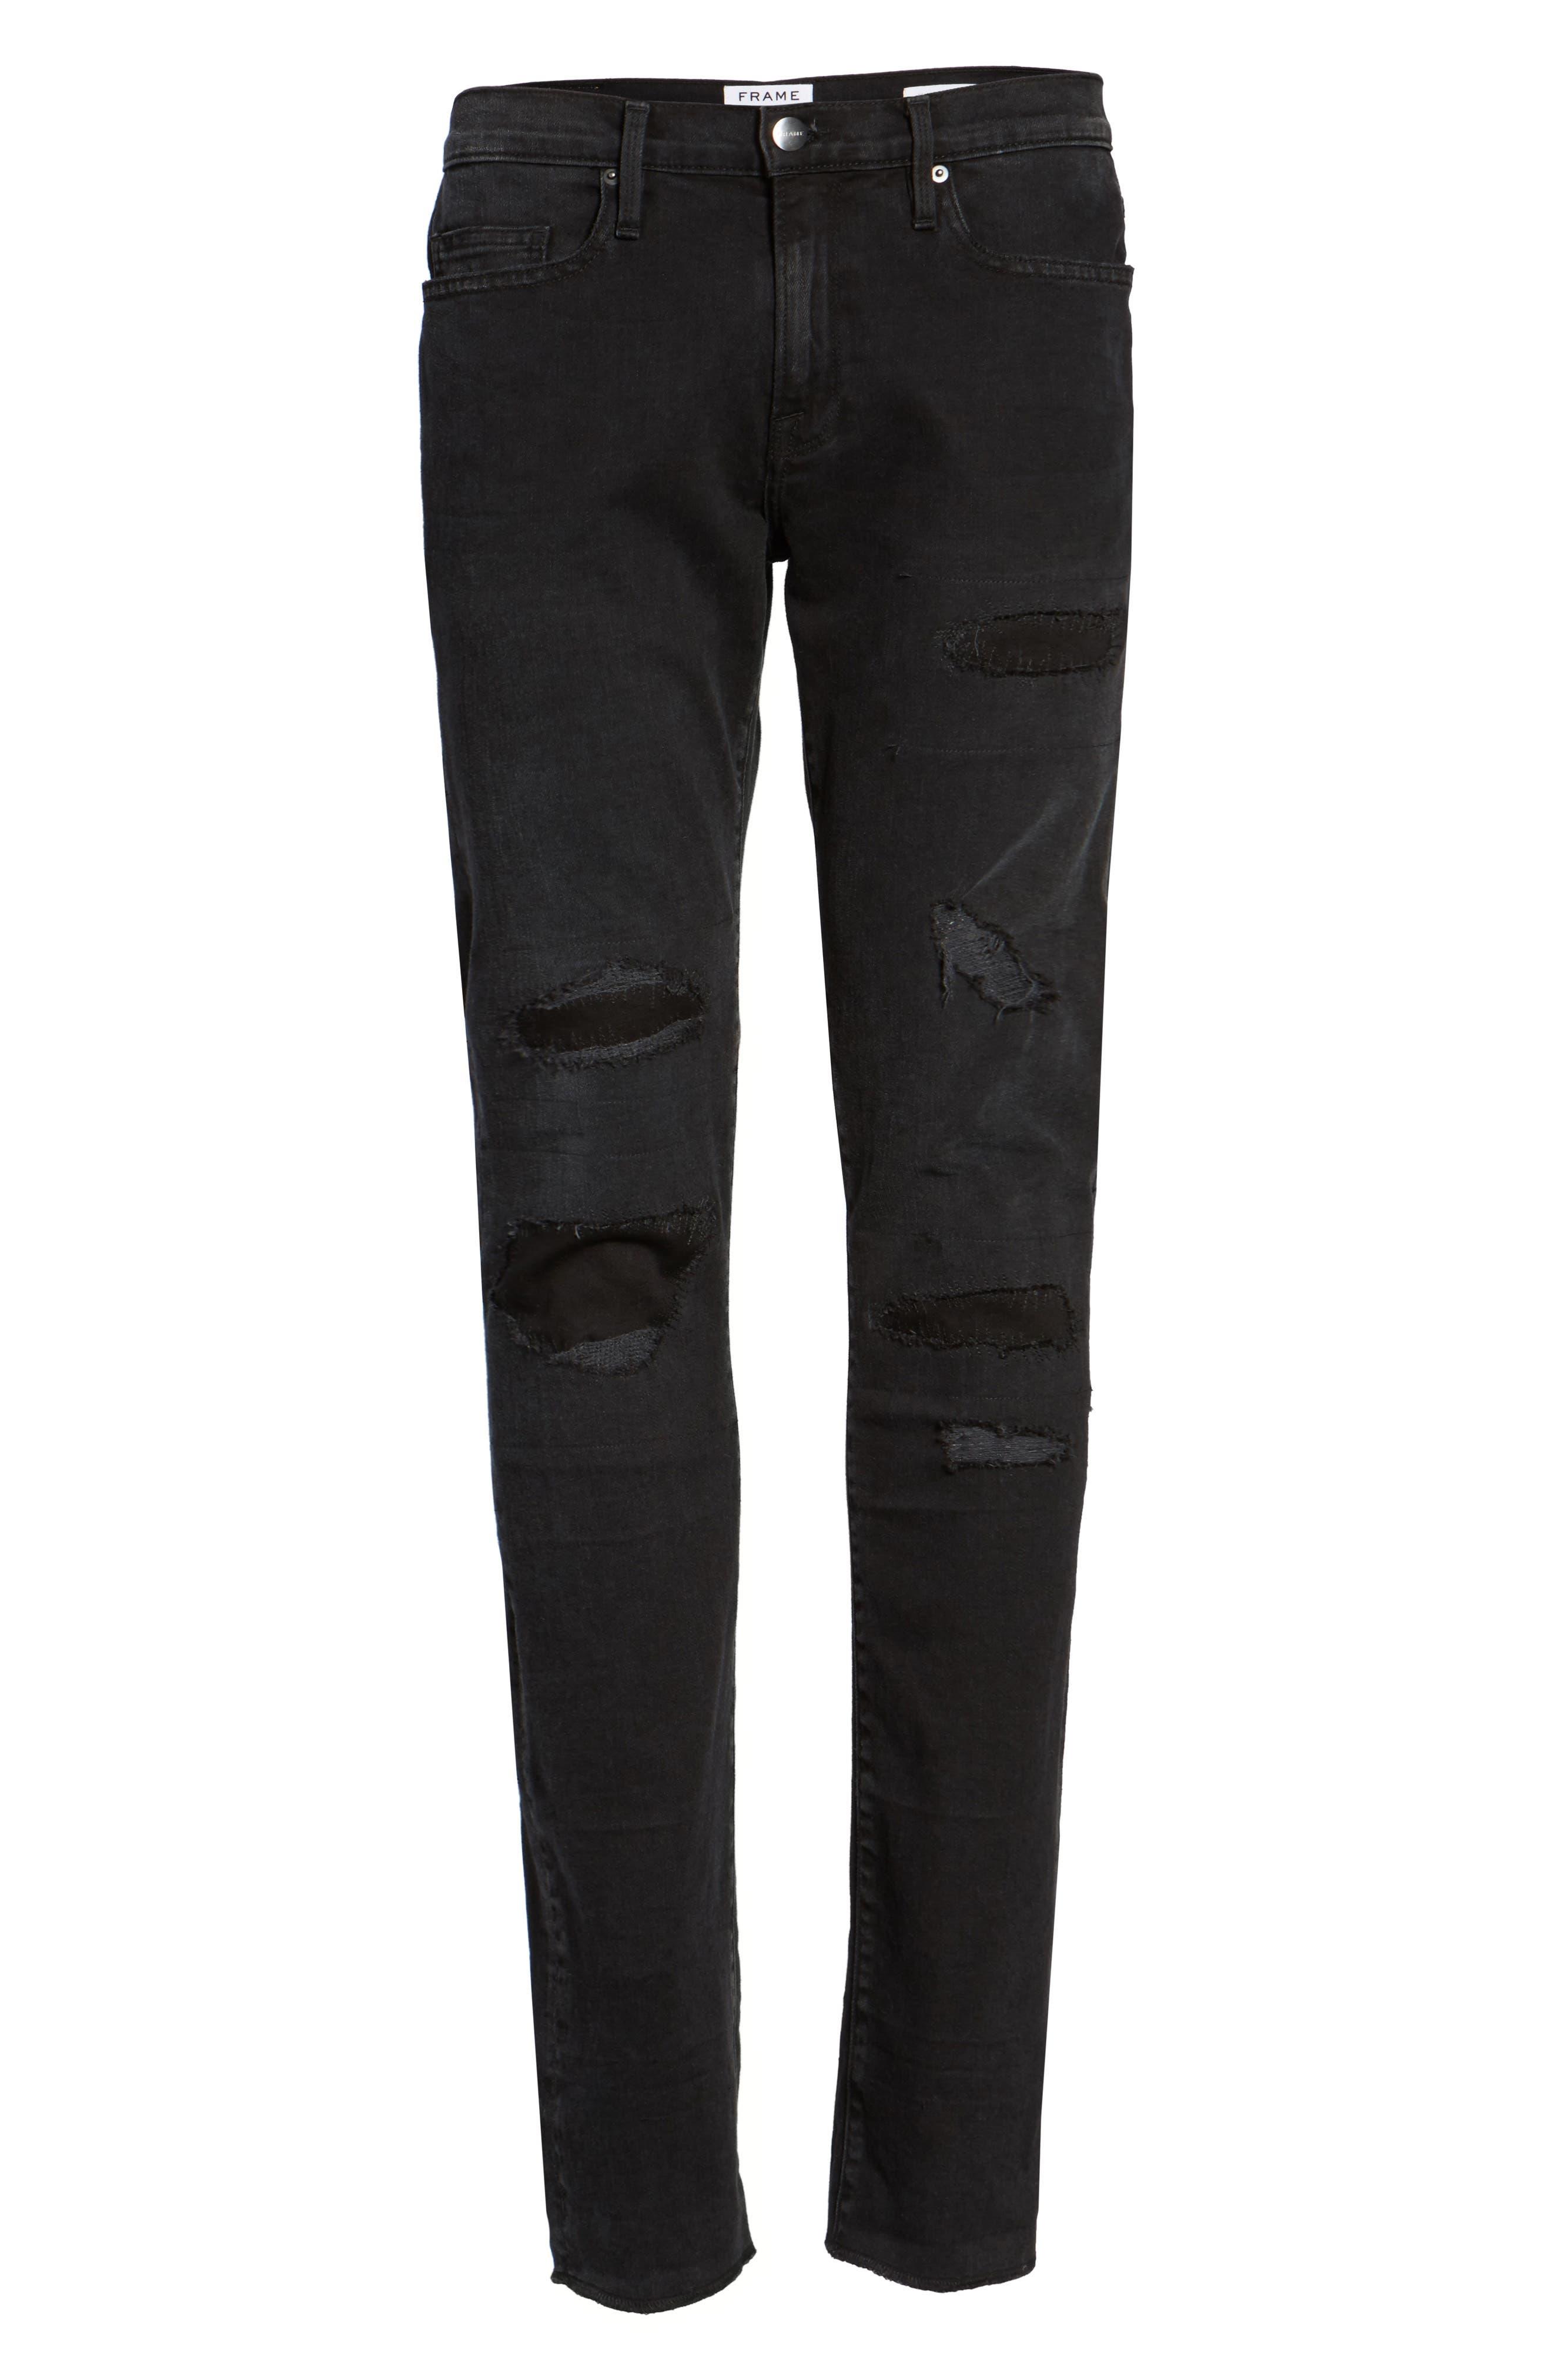 L'Homme Skinny Fit Jeans,                             Alternate thumbnail 6, color,                             001